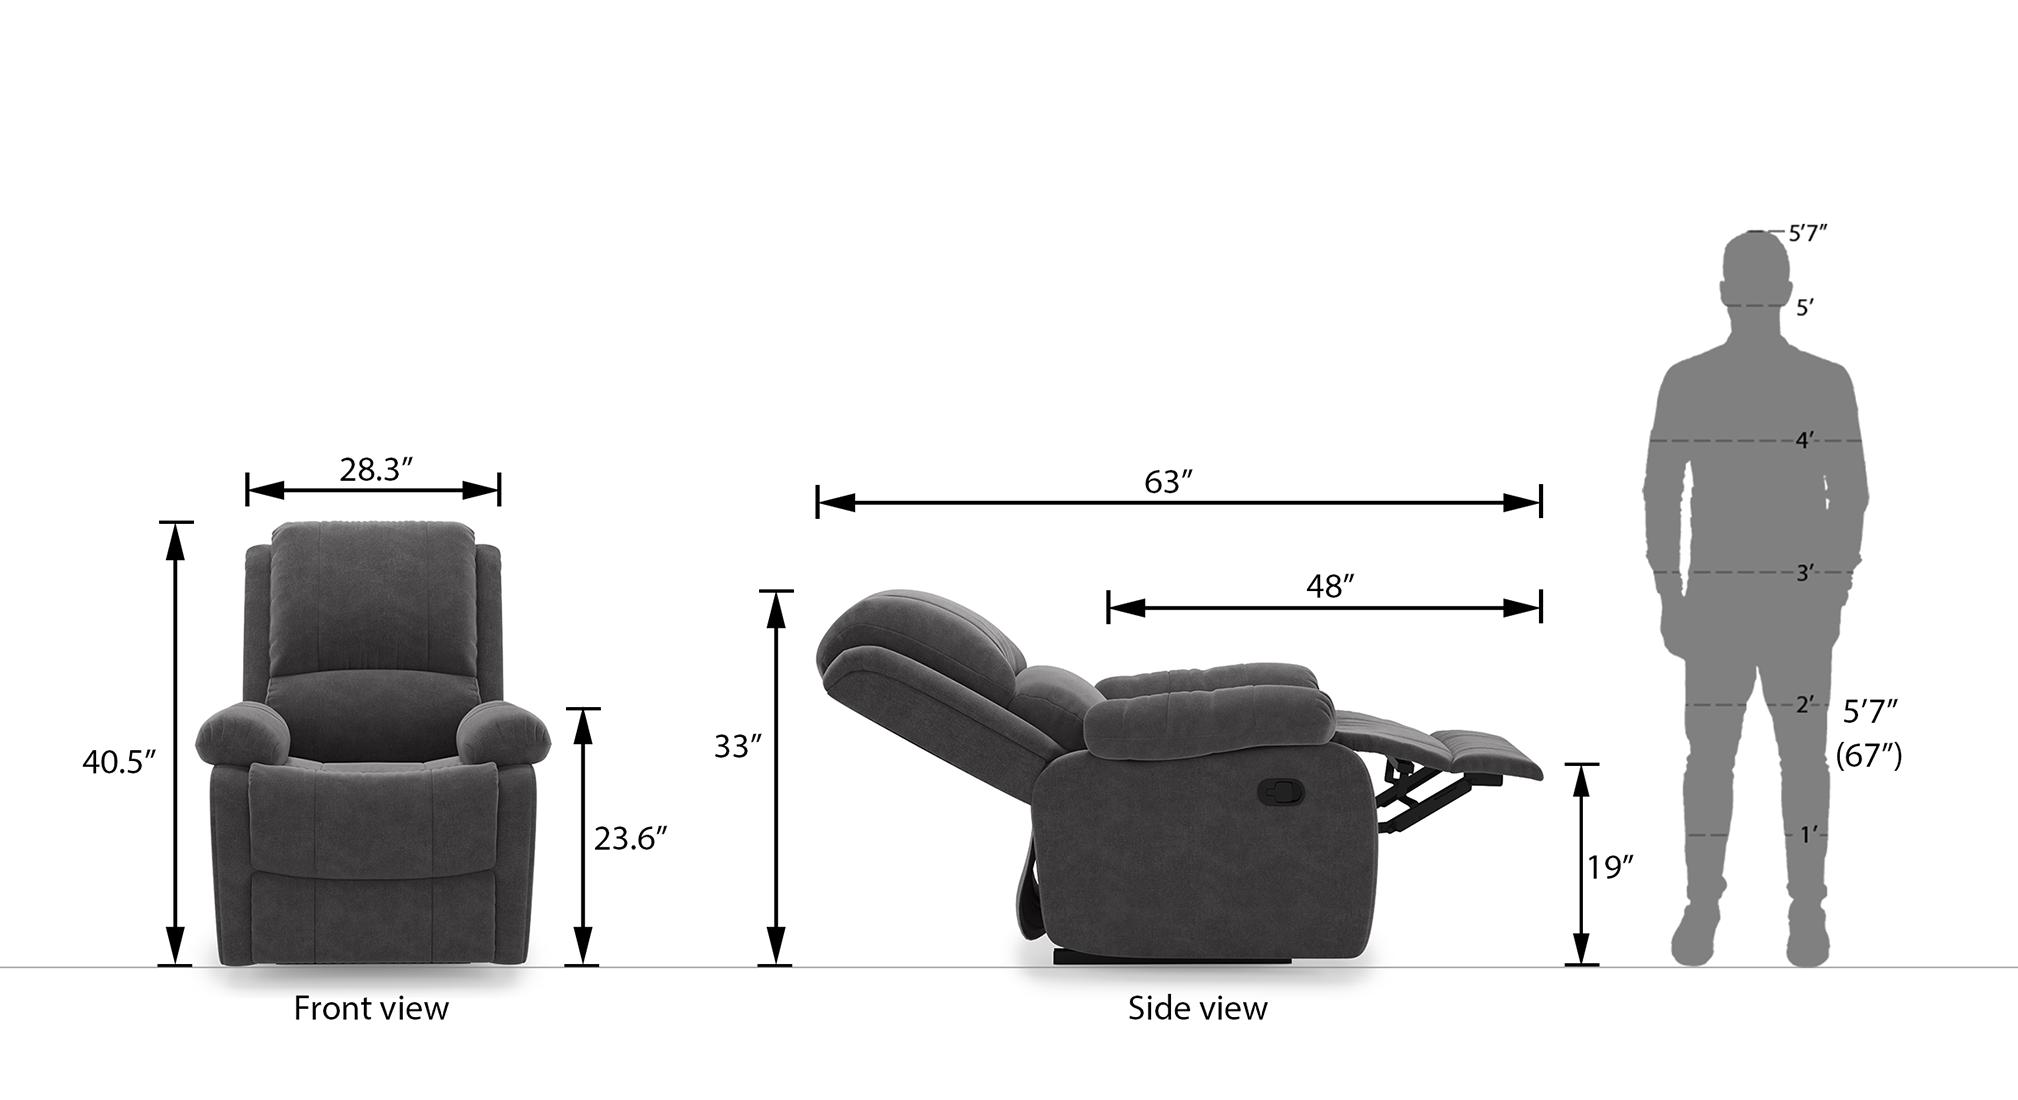 Lebowski single seater sm 22